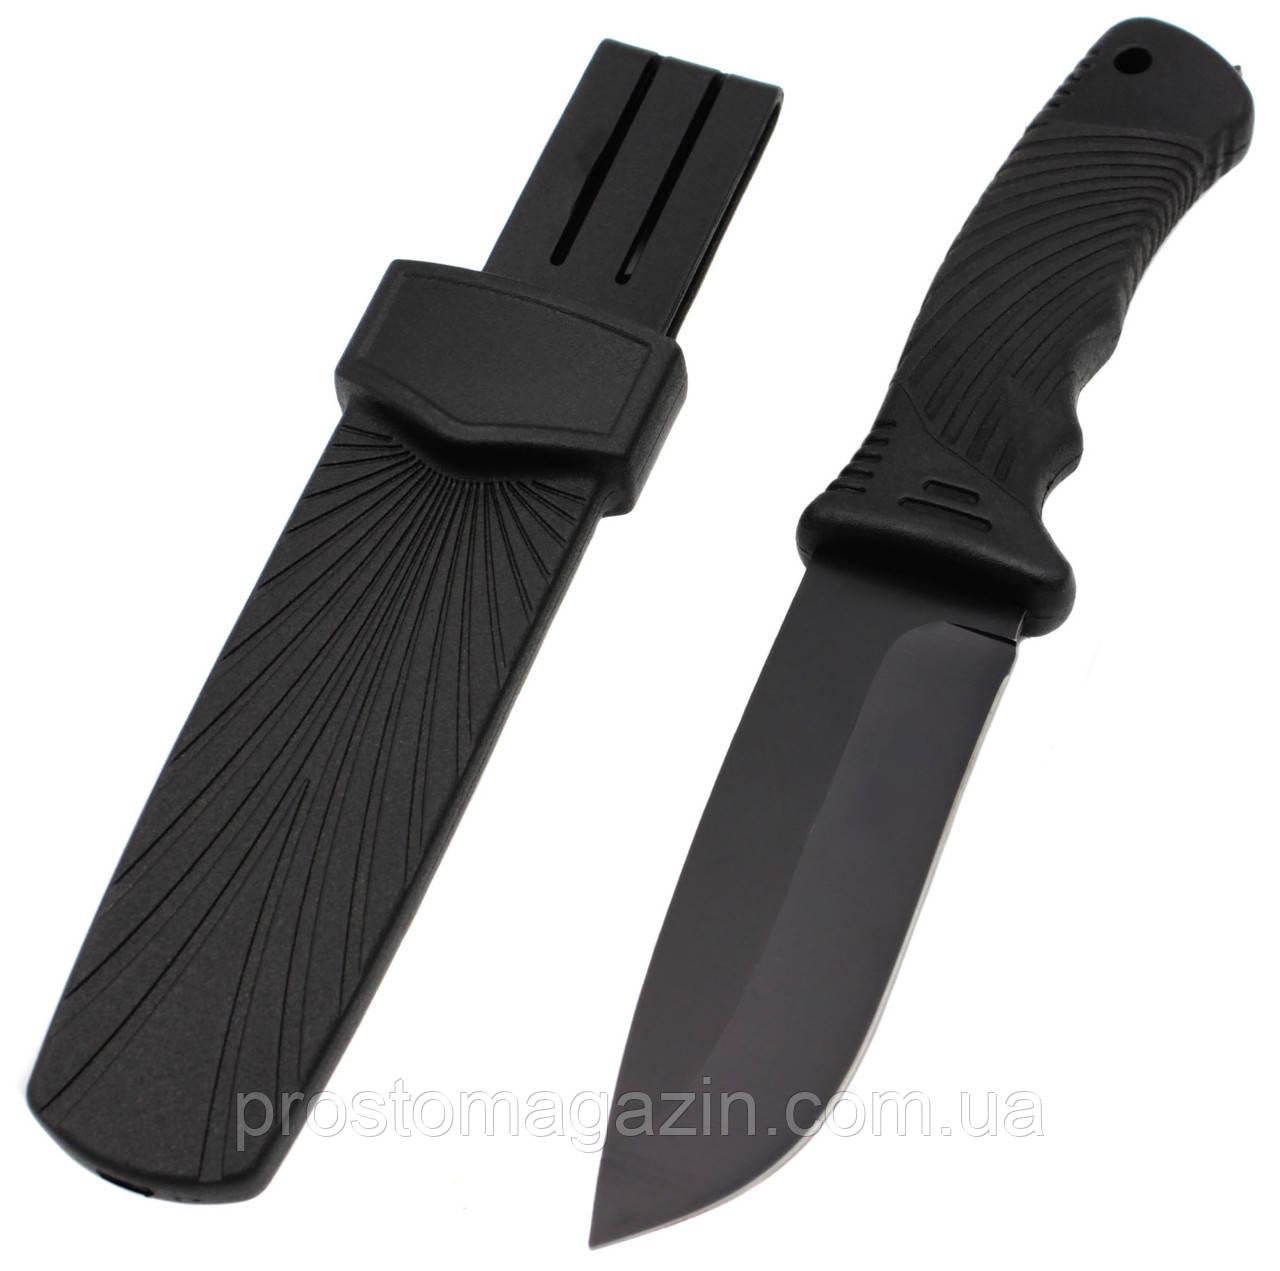 Нож охотничий Columbia 1638А